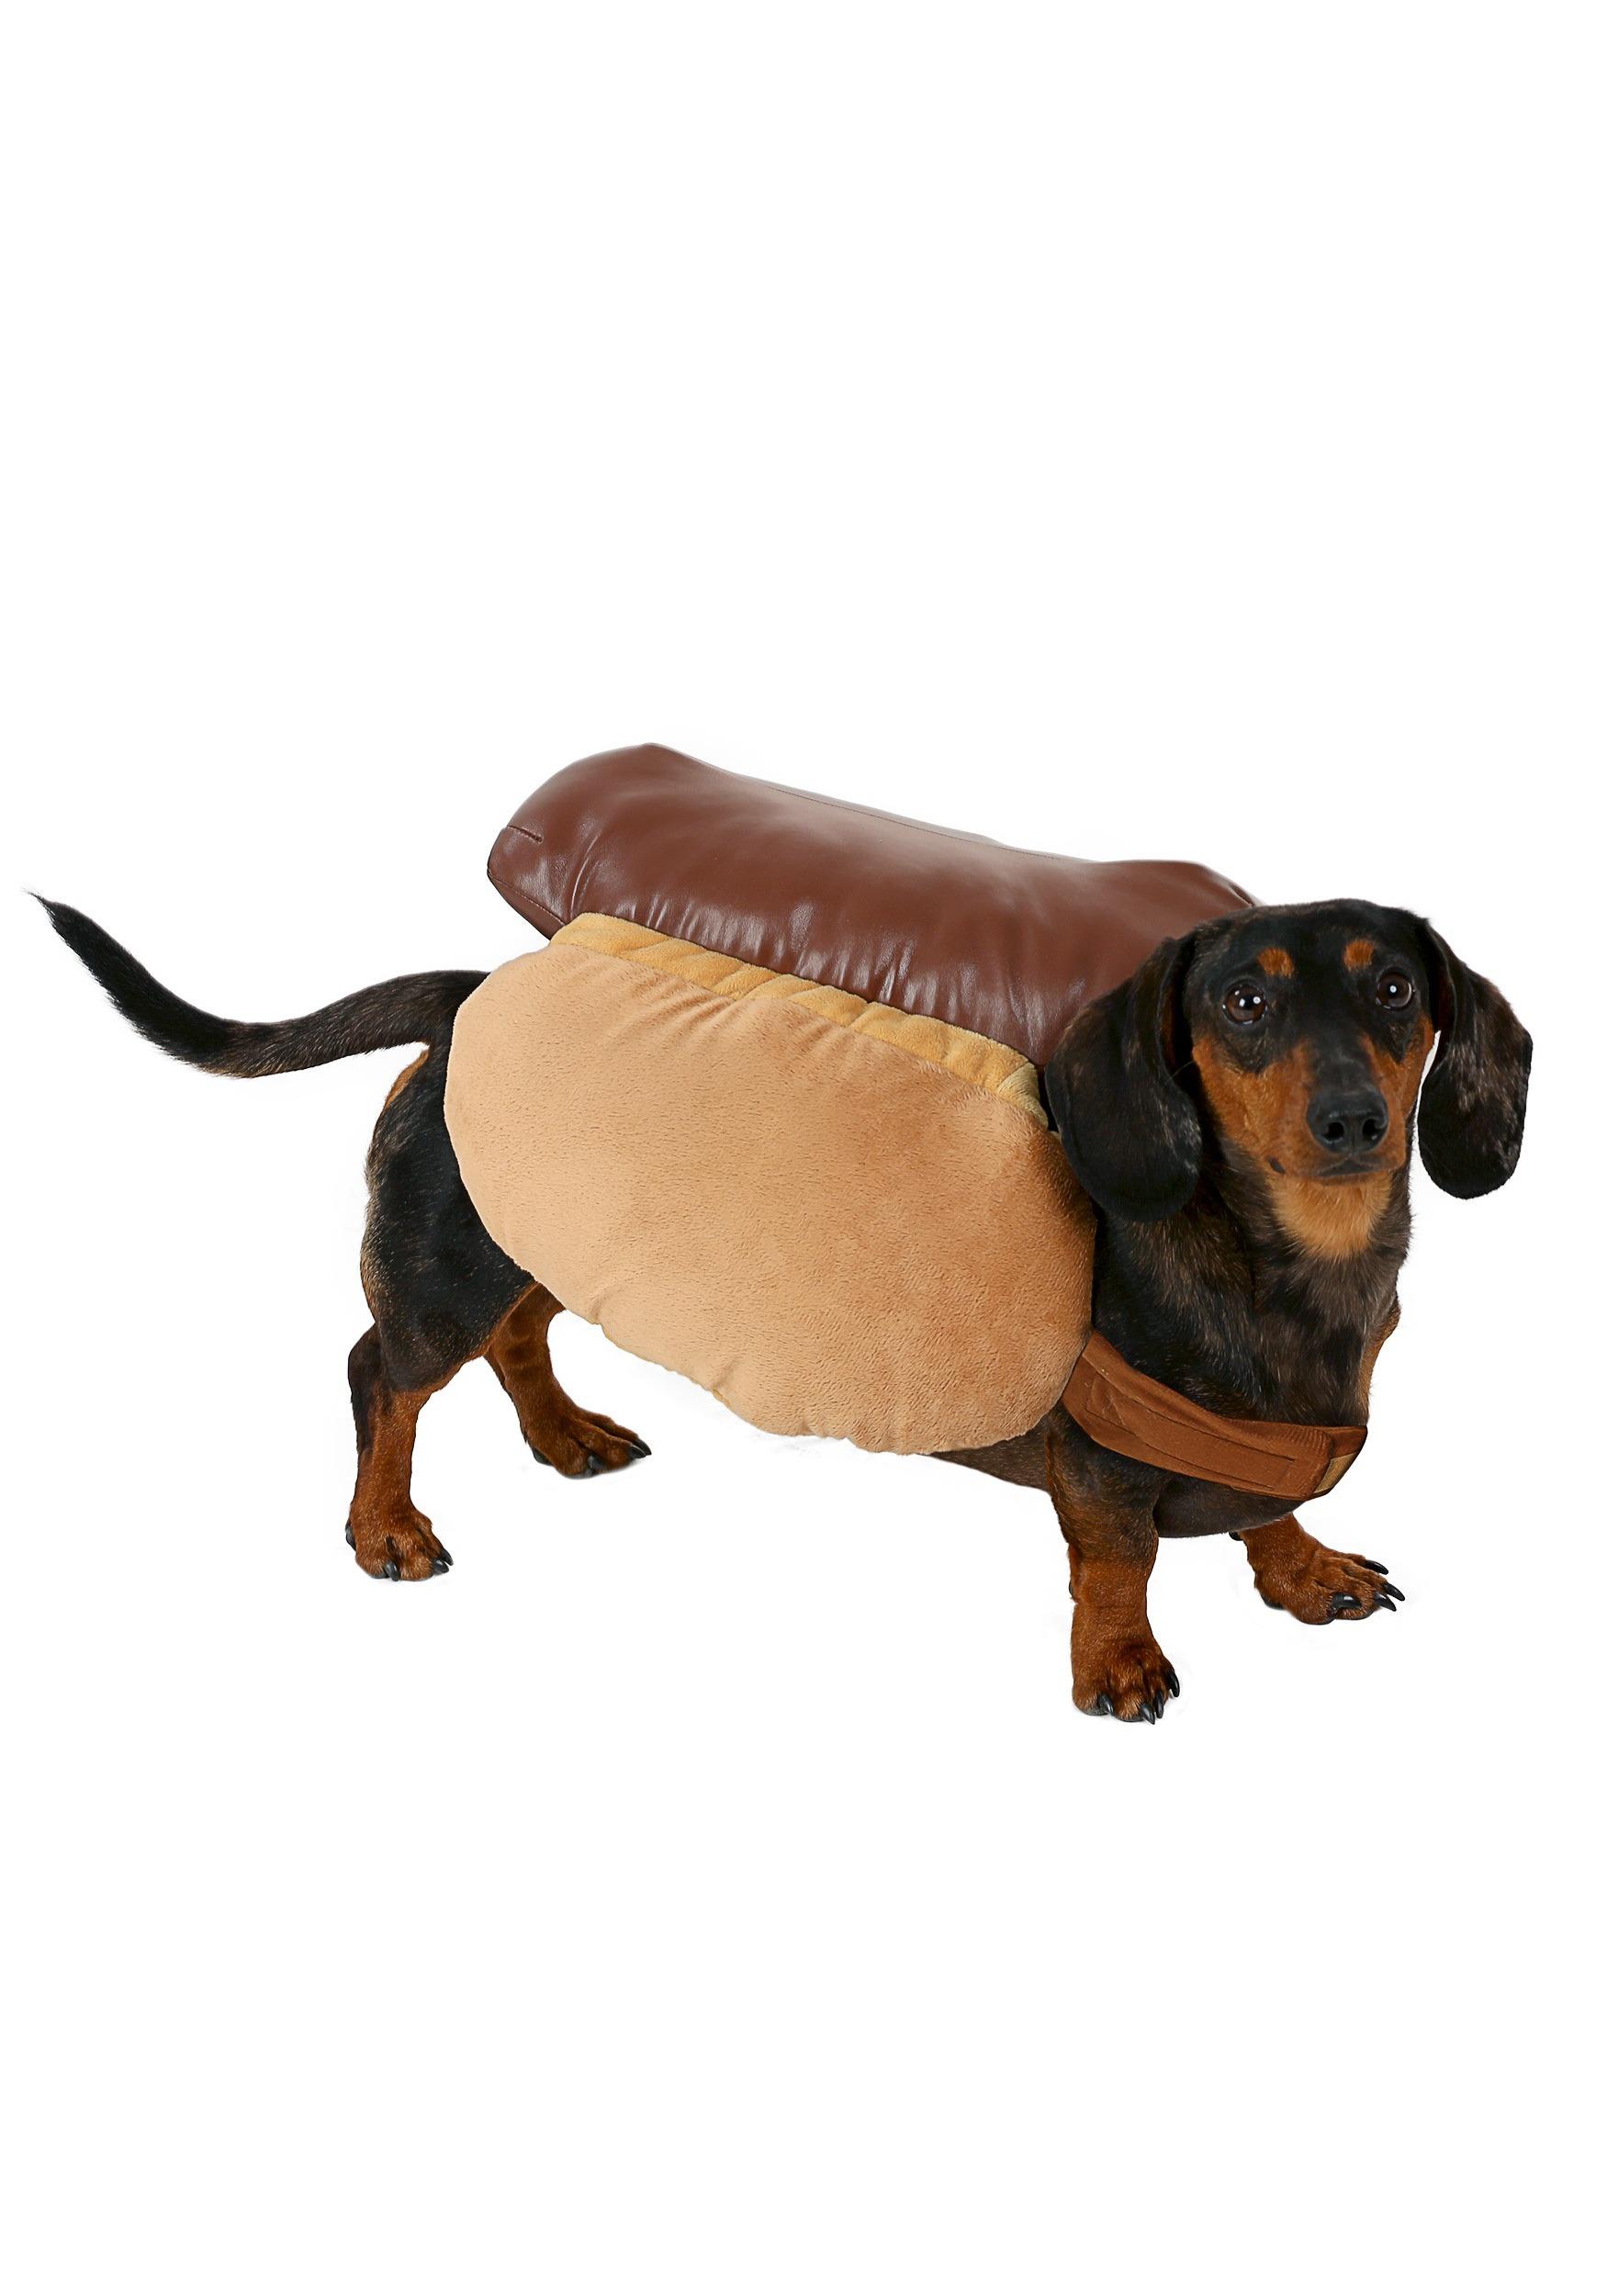 Sausage Dog In Hot Dog Costume